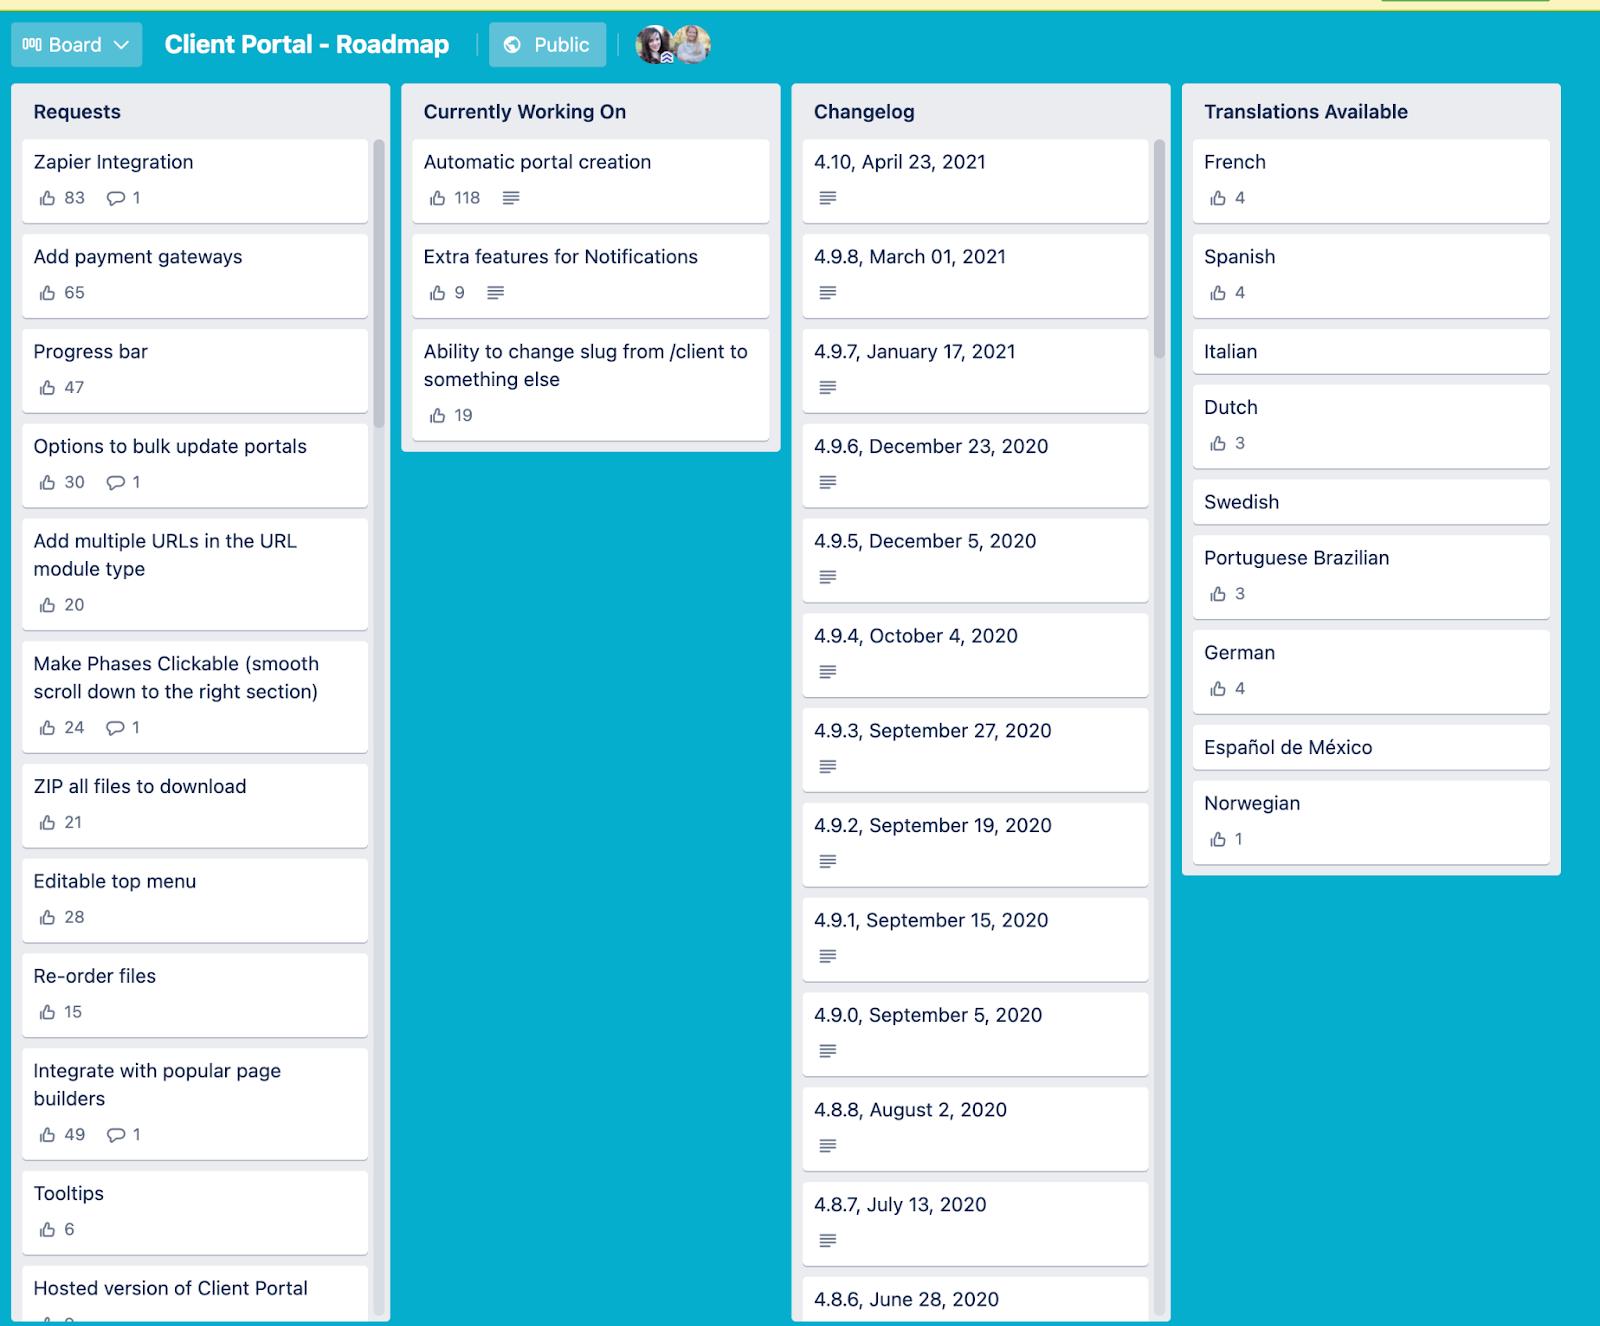 client's portal roadmap